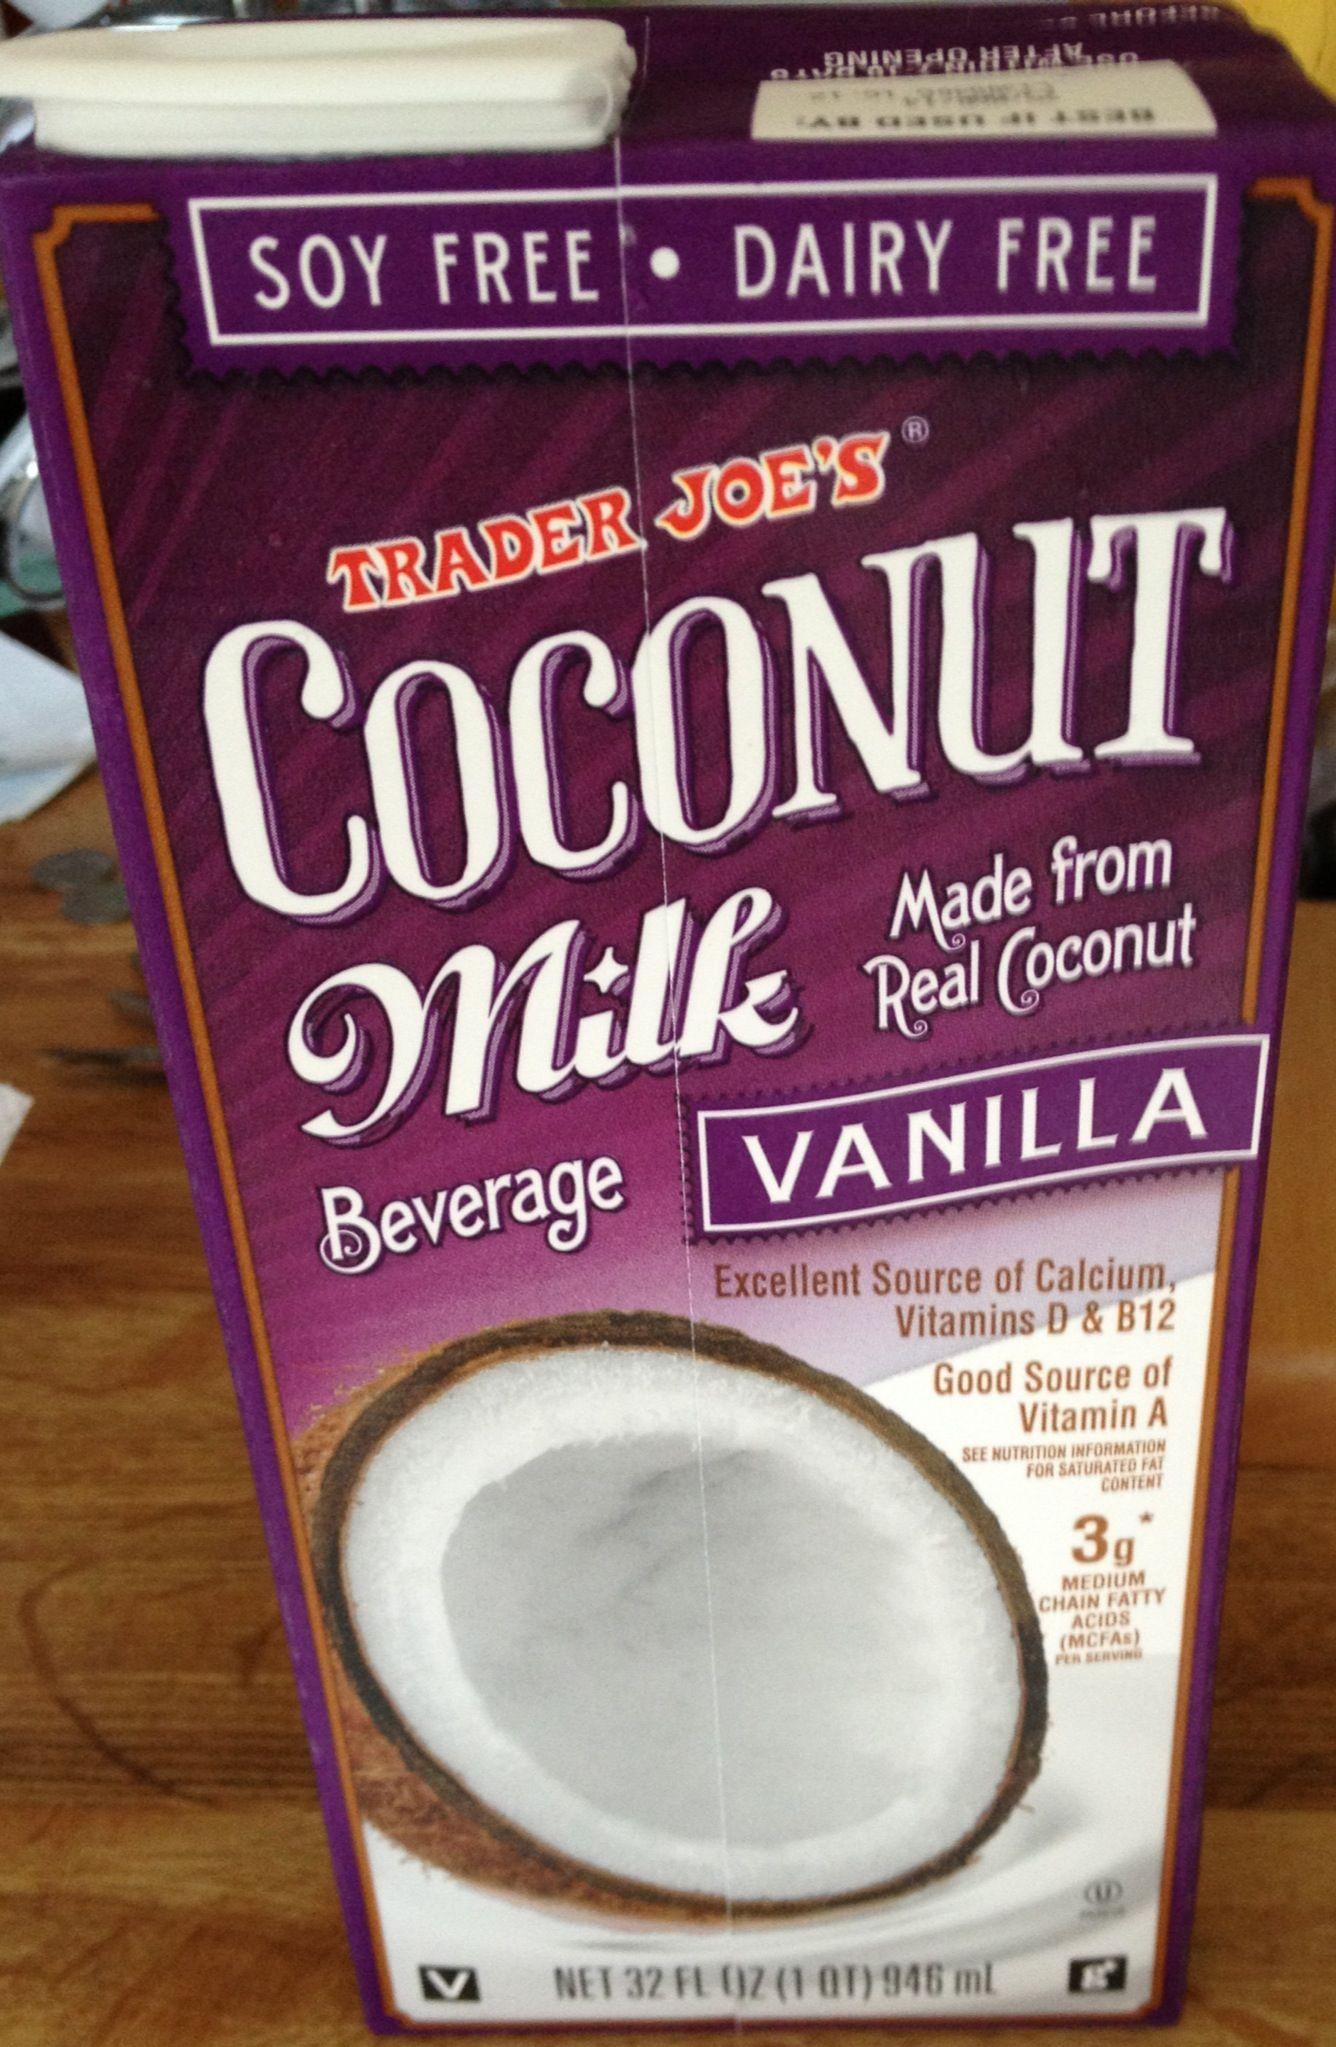 Trader Joe's Coconut milk is the best!